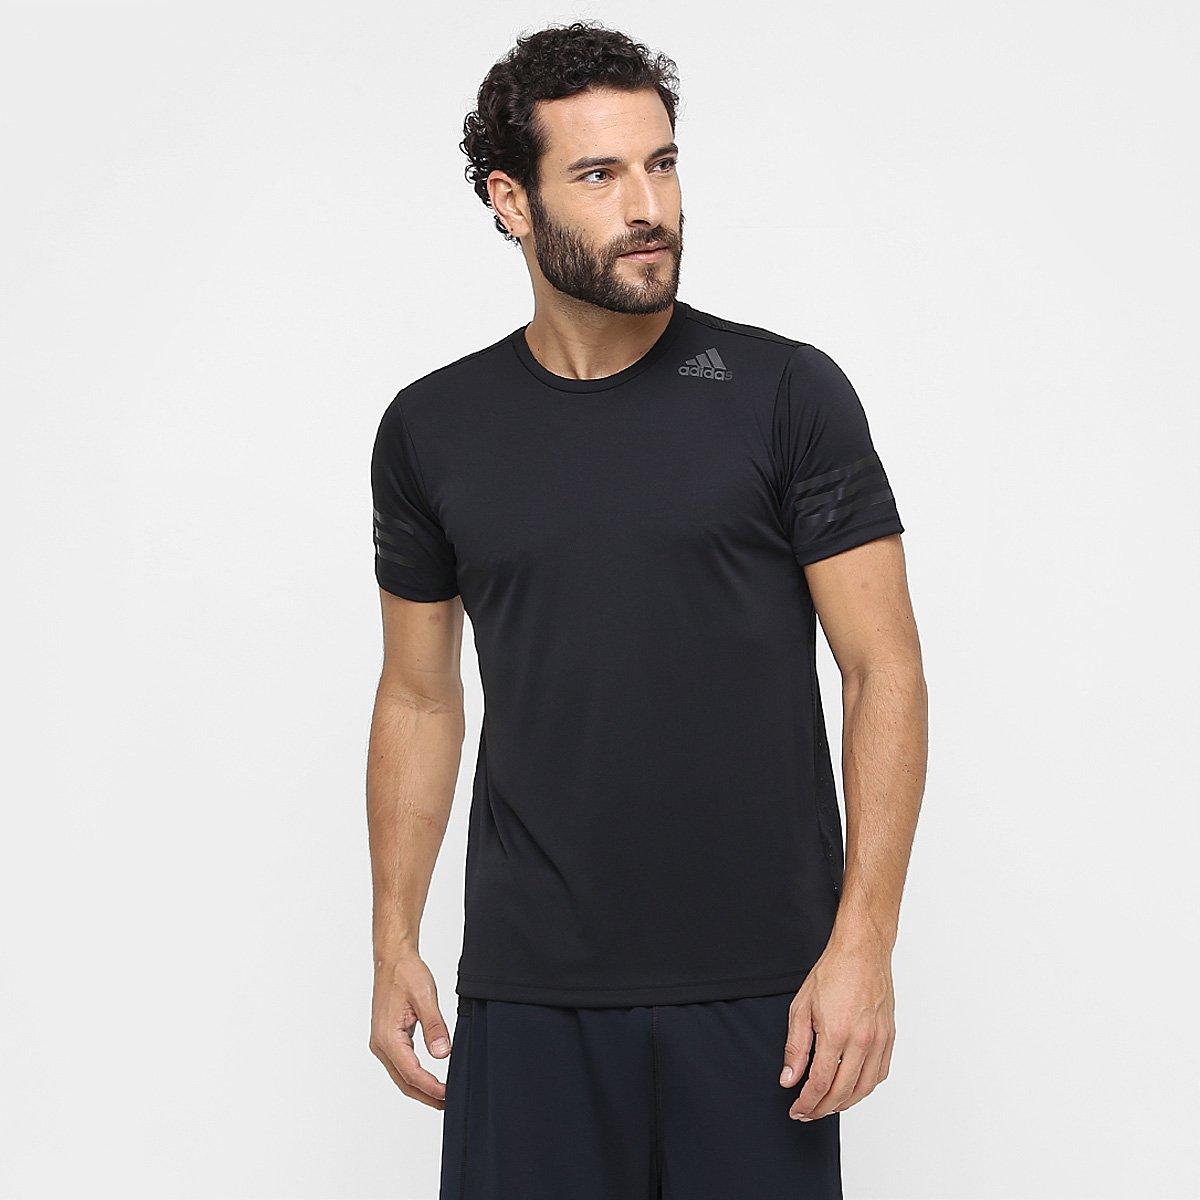 6549972954c Camiseta Adidas Climacool Masculina - Compre Agora